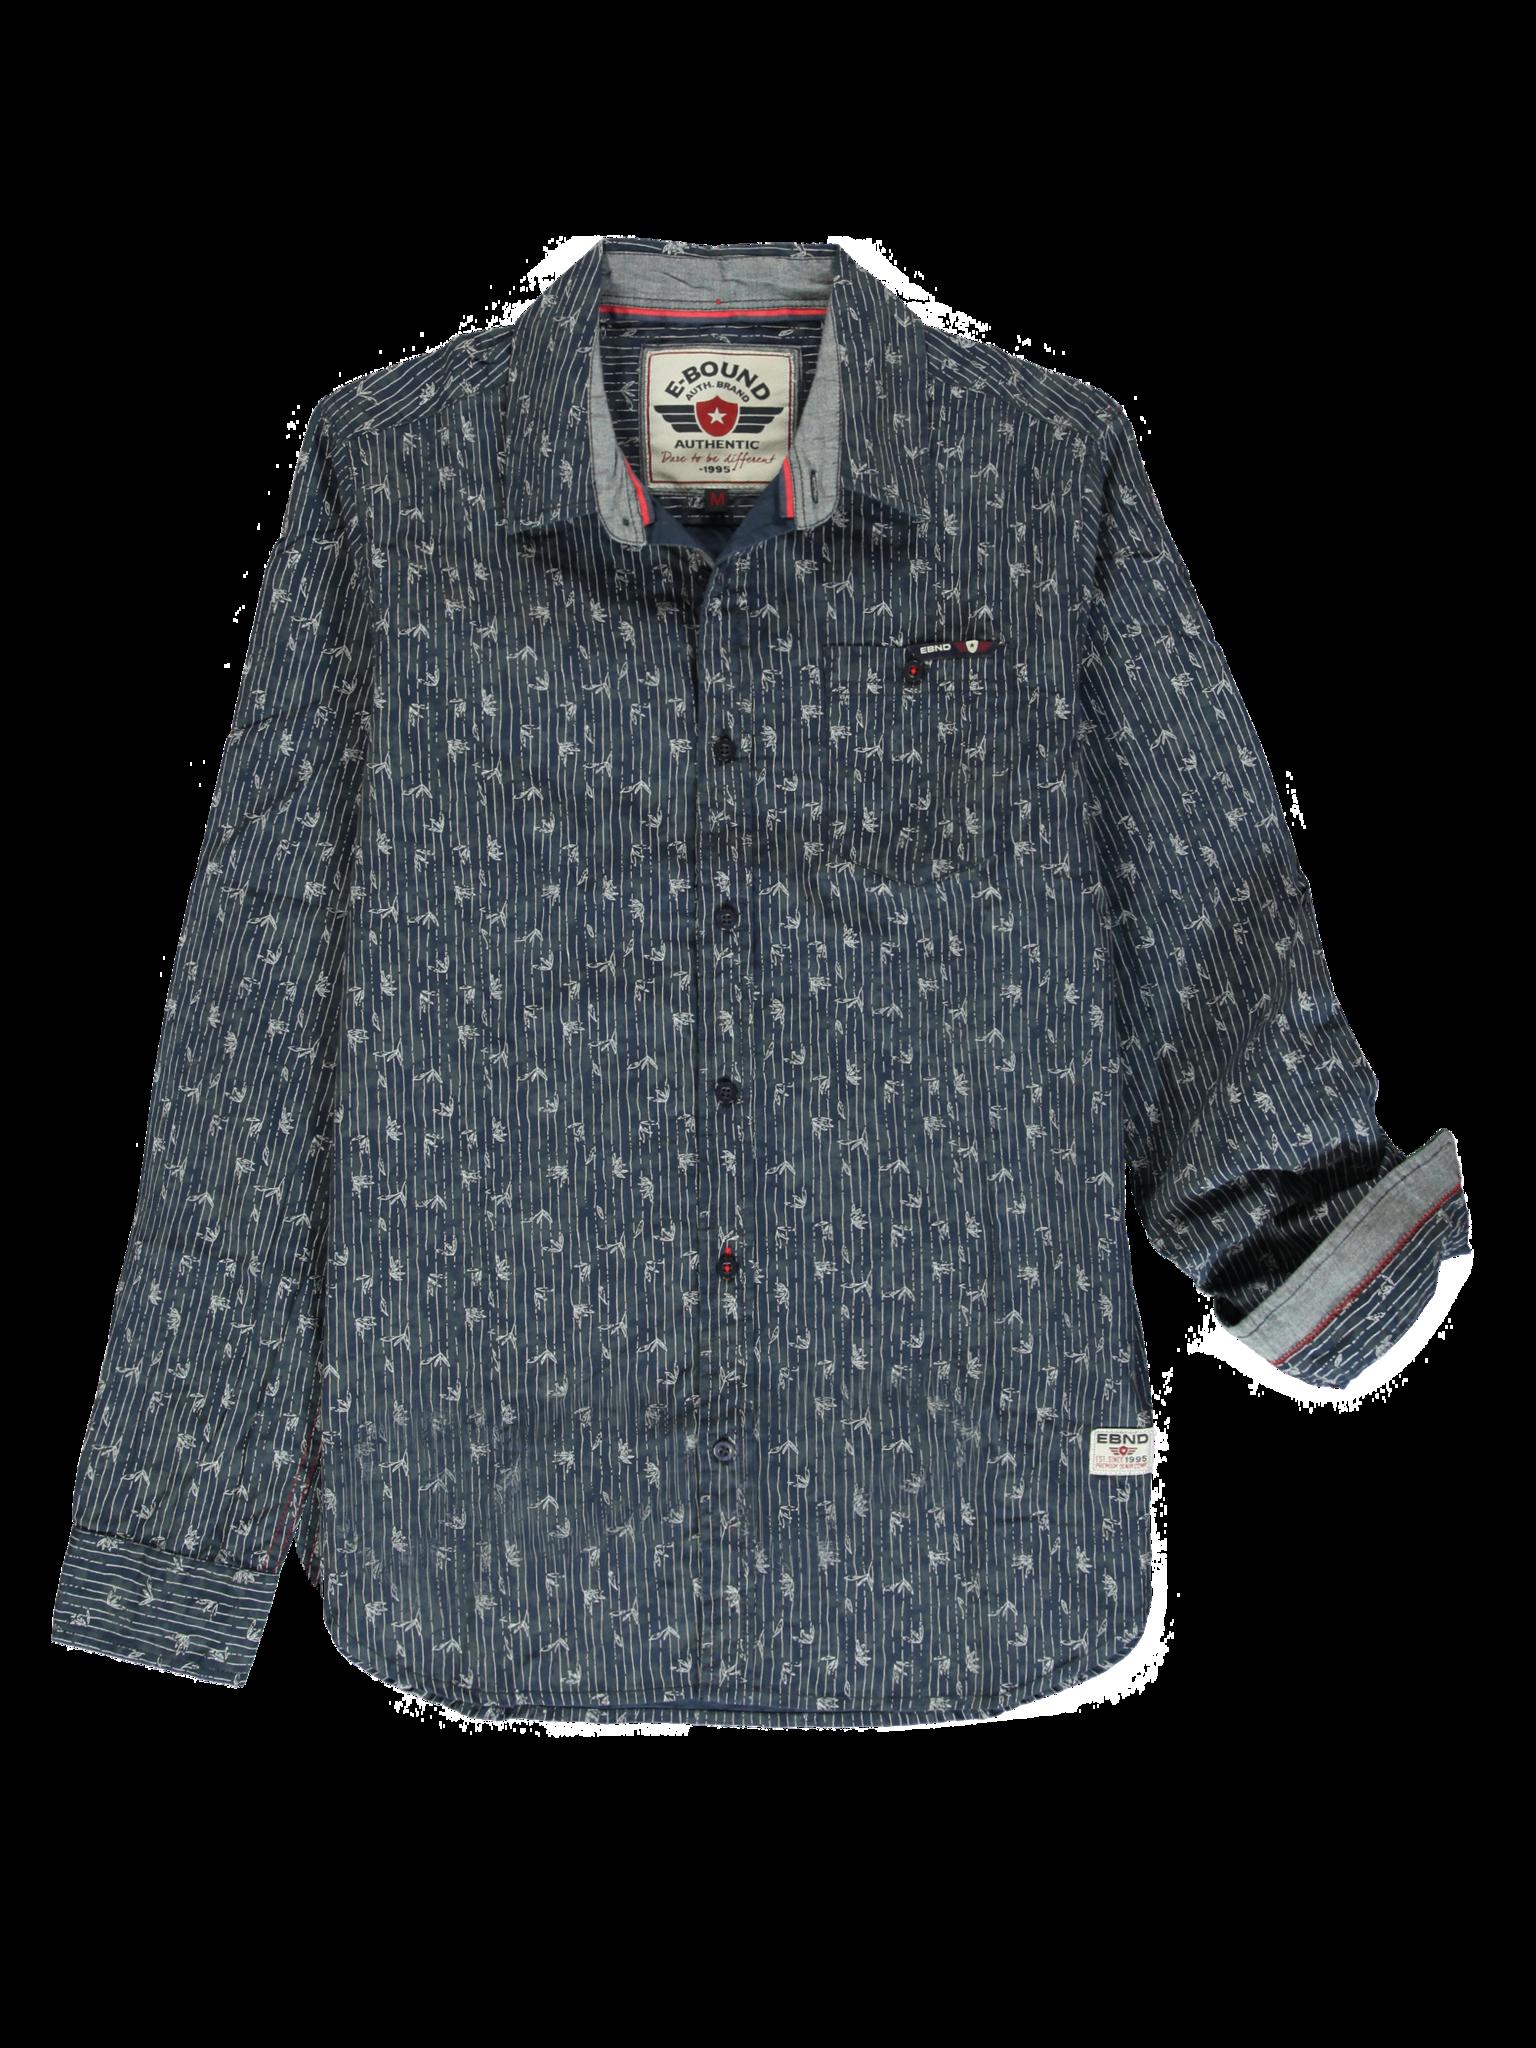 All Brands | Winterproducts Men | Shirt | 18 pcs/box